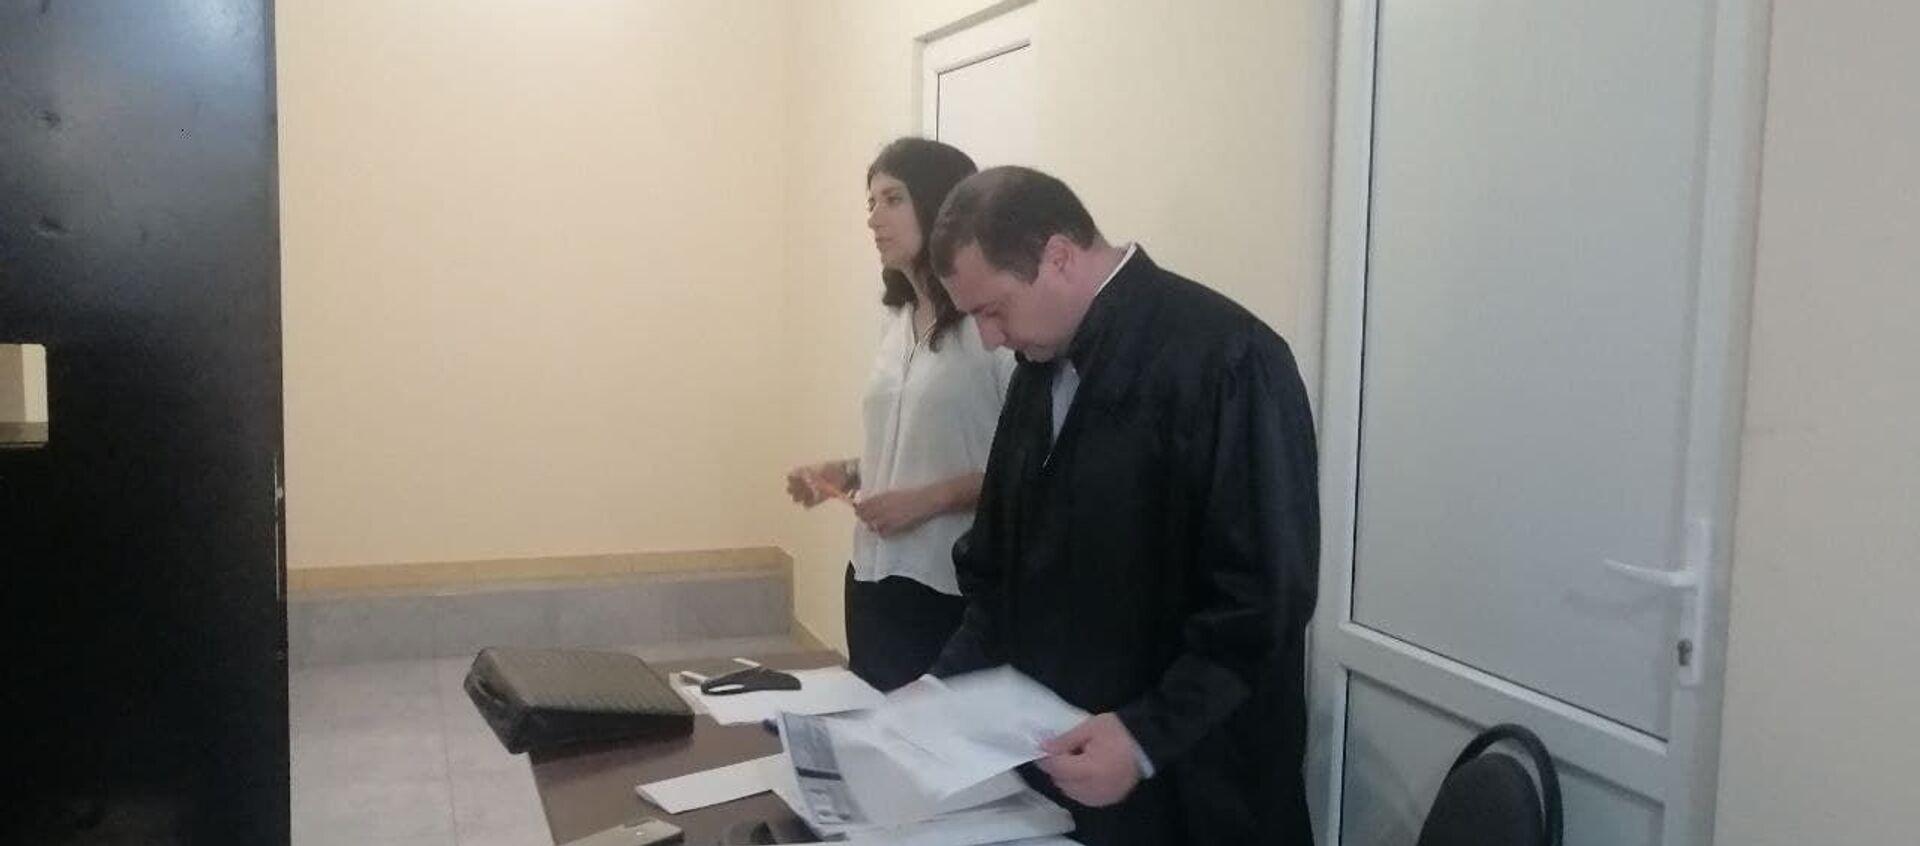 Суд над Дмитрием Пилия в Гулрыпшском госпитале - Sputnik Абхазия, 1920, 16.06.2021